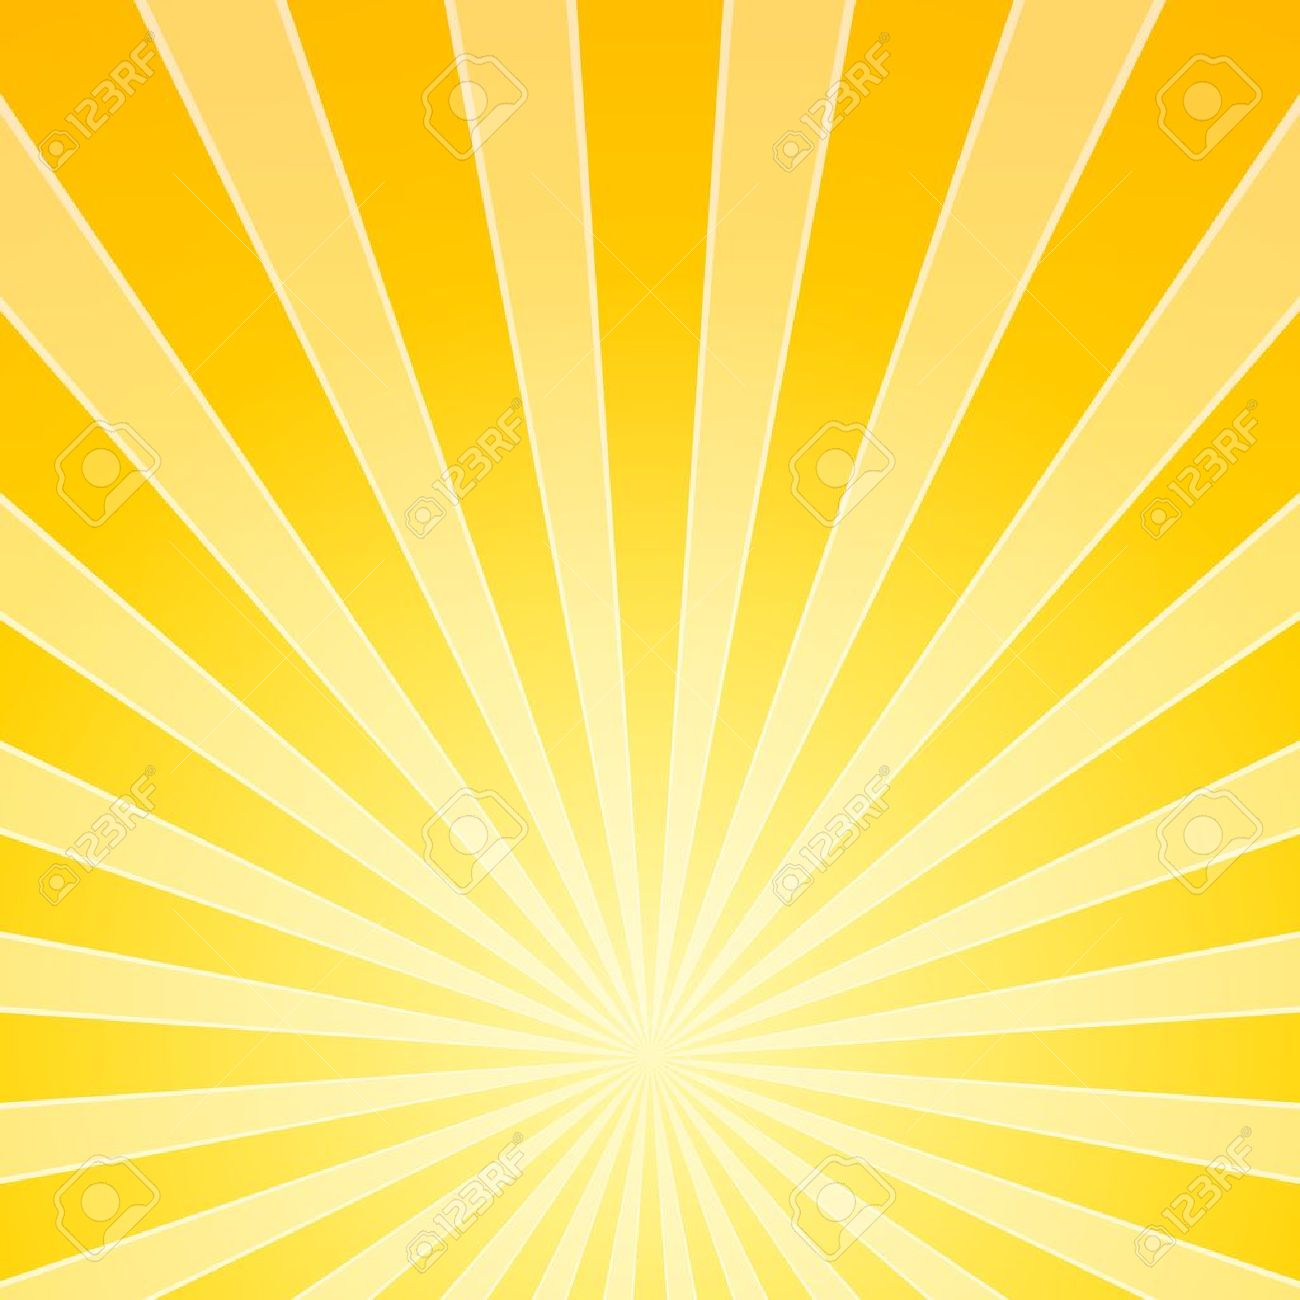 Yellow Bright Ligh Beams Stock Vector - 16645464